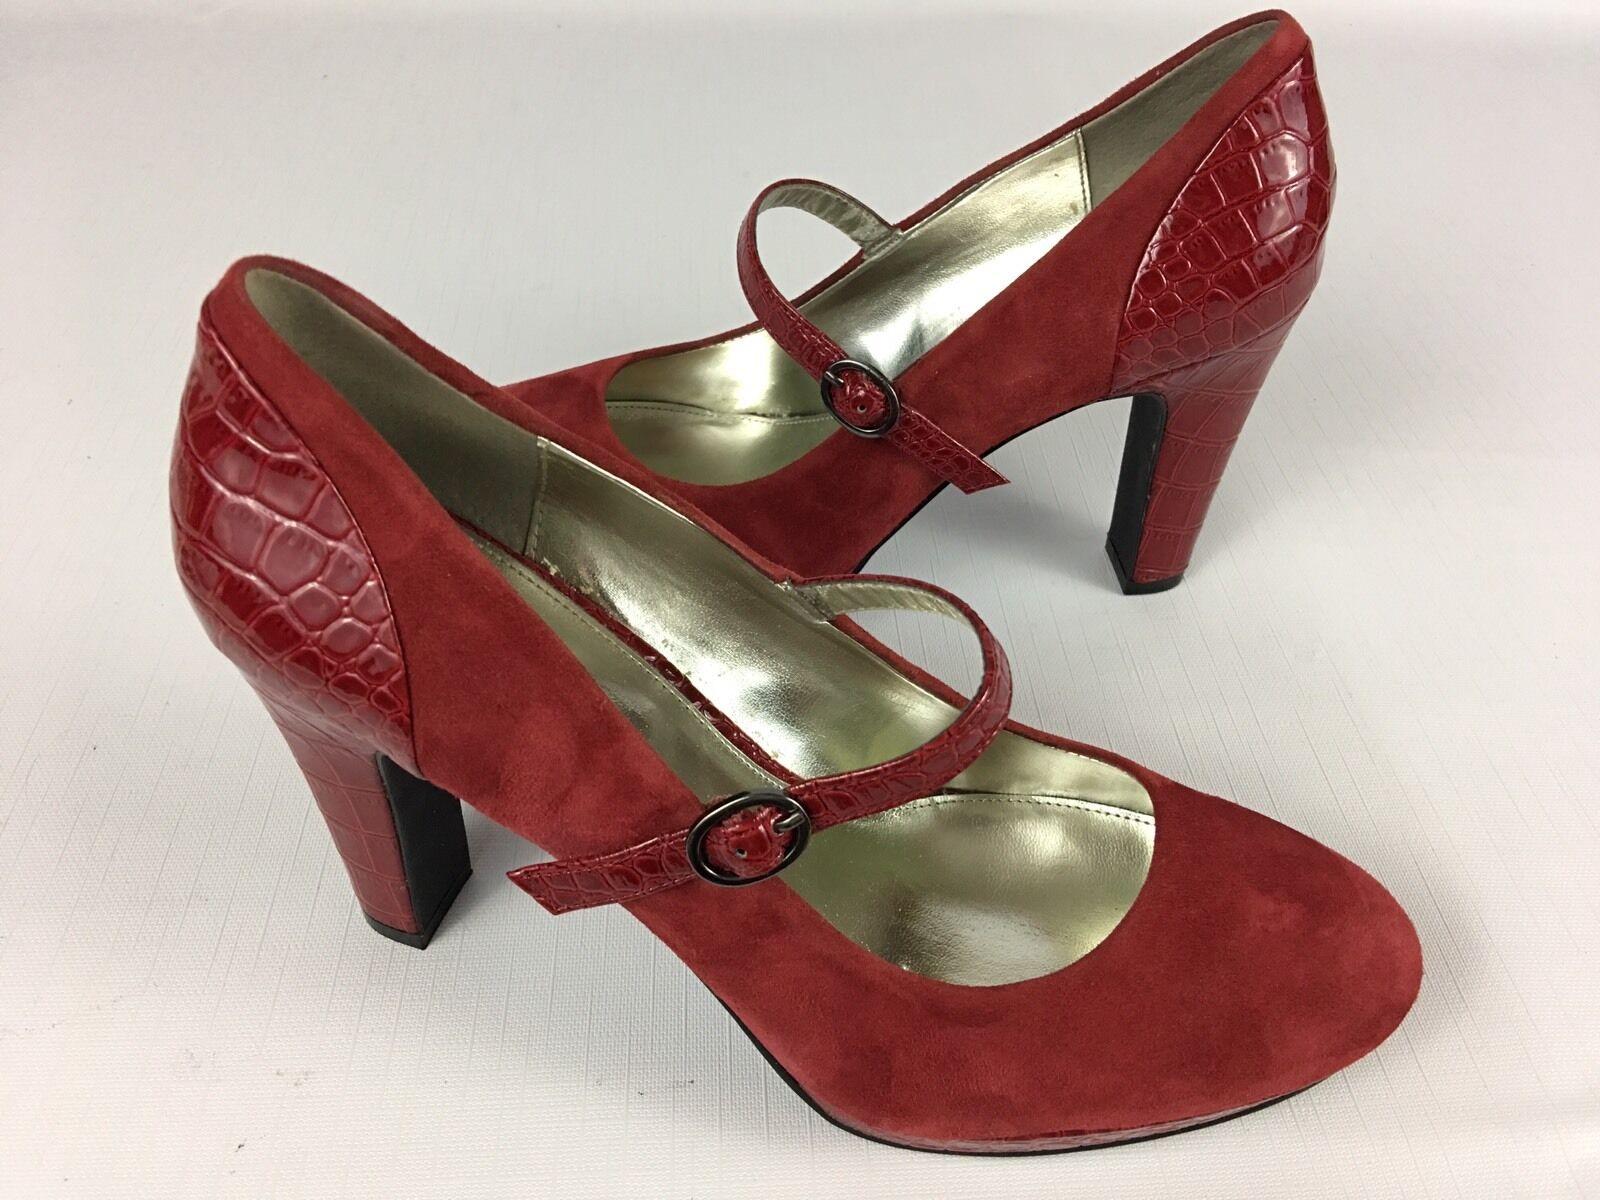 Women's ALFANI Croc Embossed Leather RED Mary Jane Platform Pumps Heels - 9M